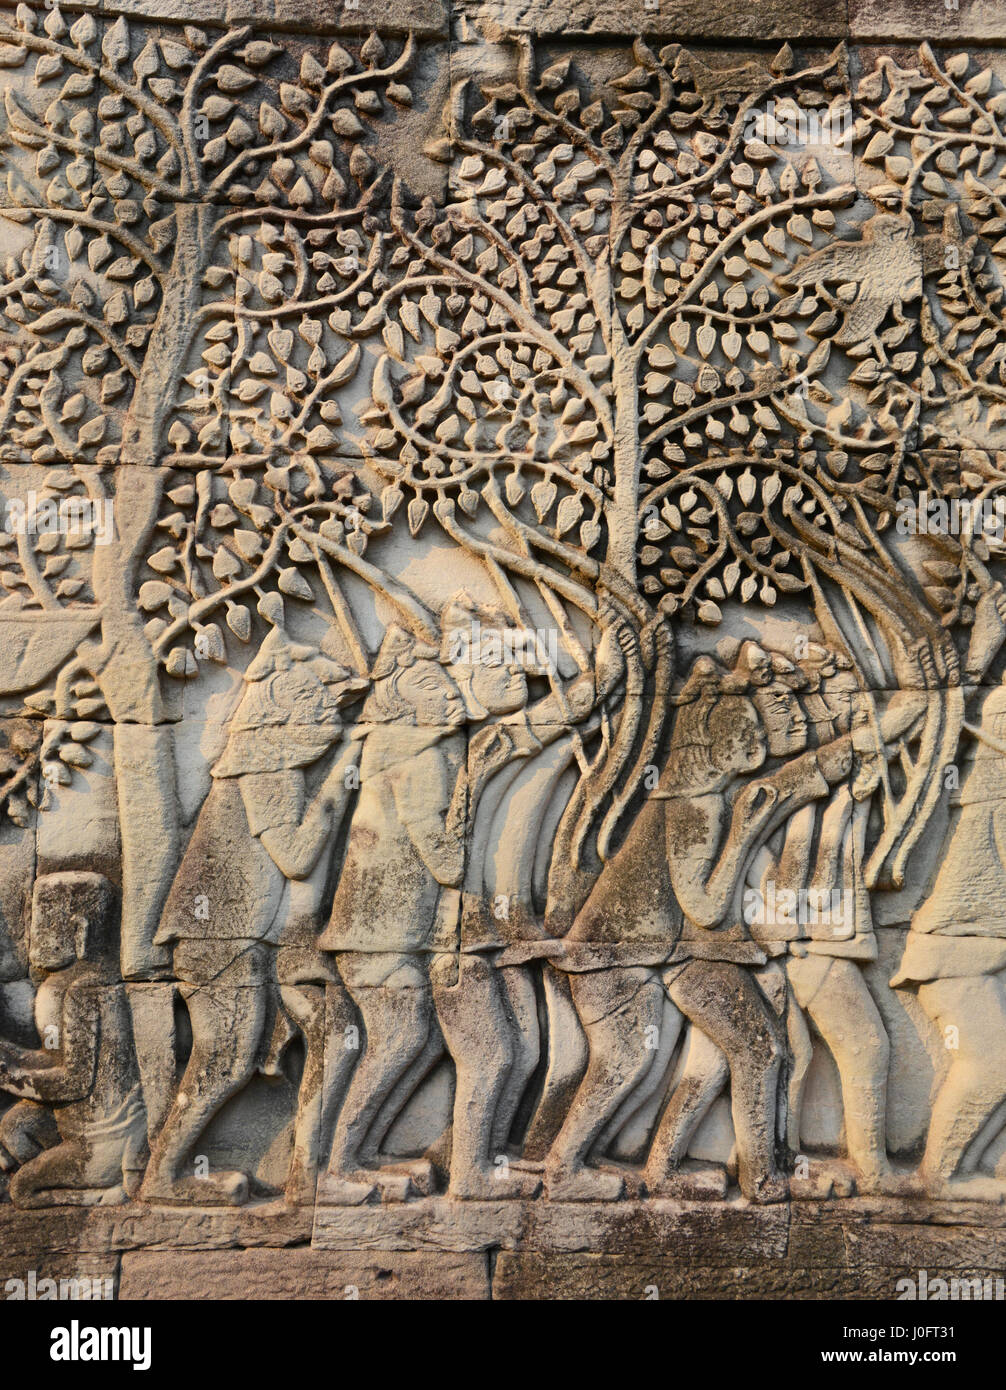 Temples at Angkor Thom, Siem Reap, Cambodia - Stock Image